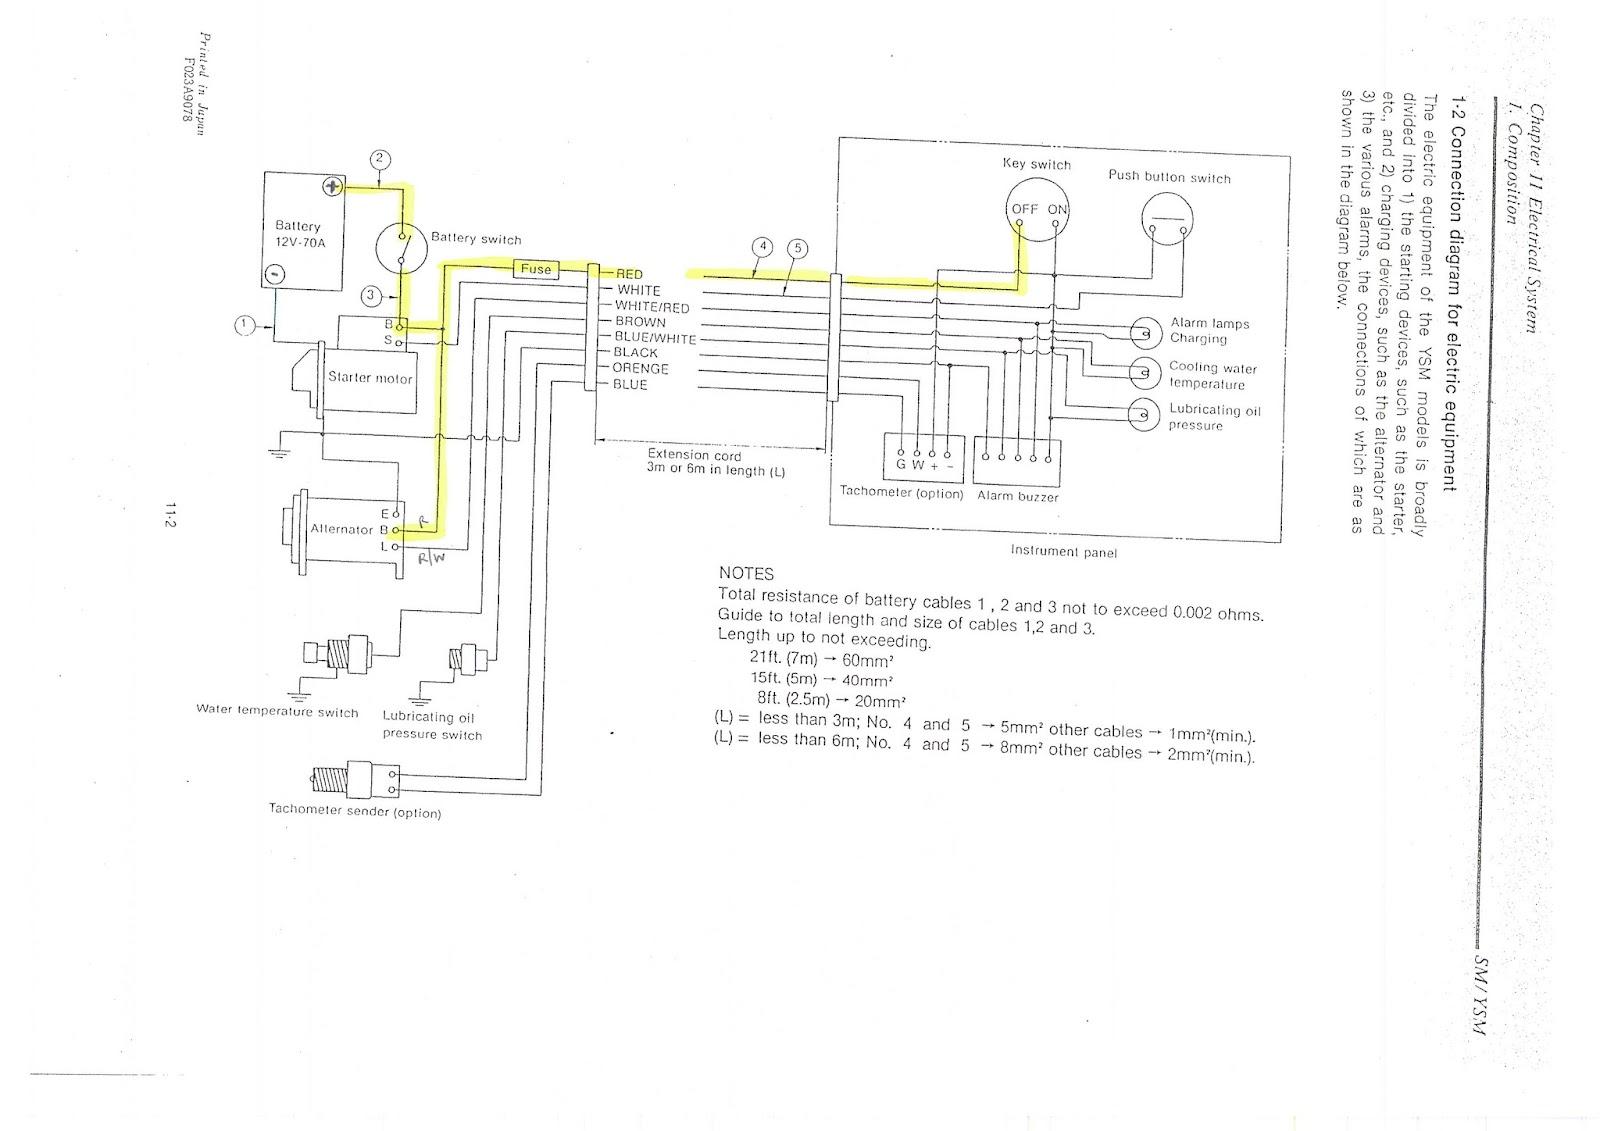 140 amp 3 wire alternator diagram